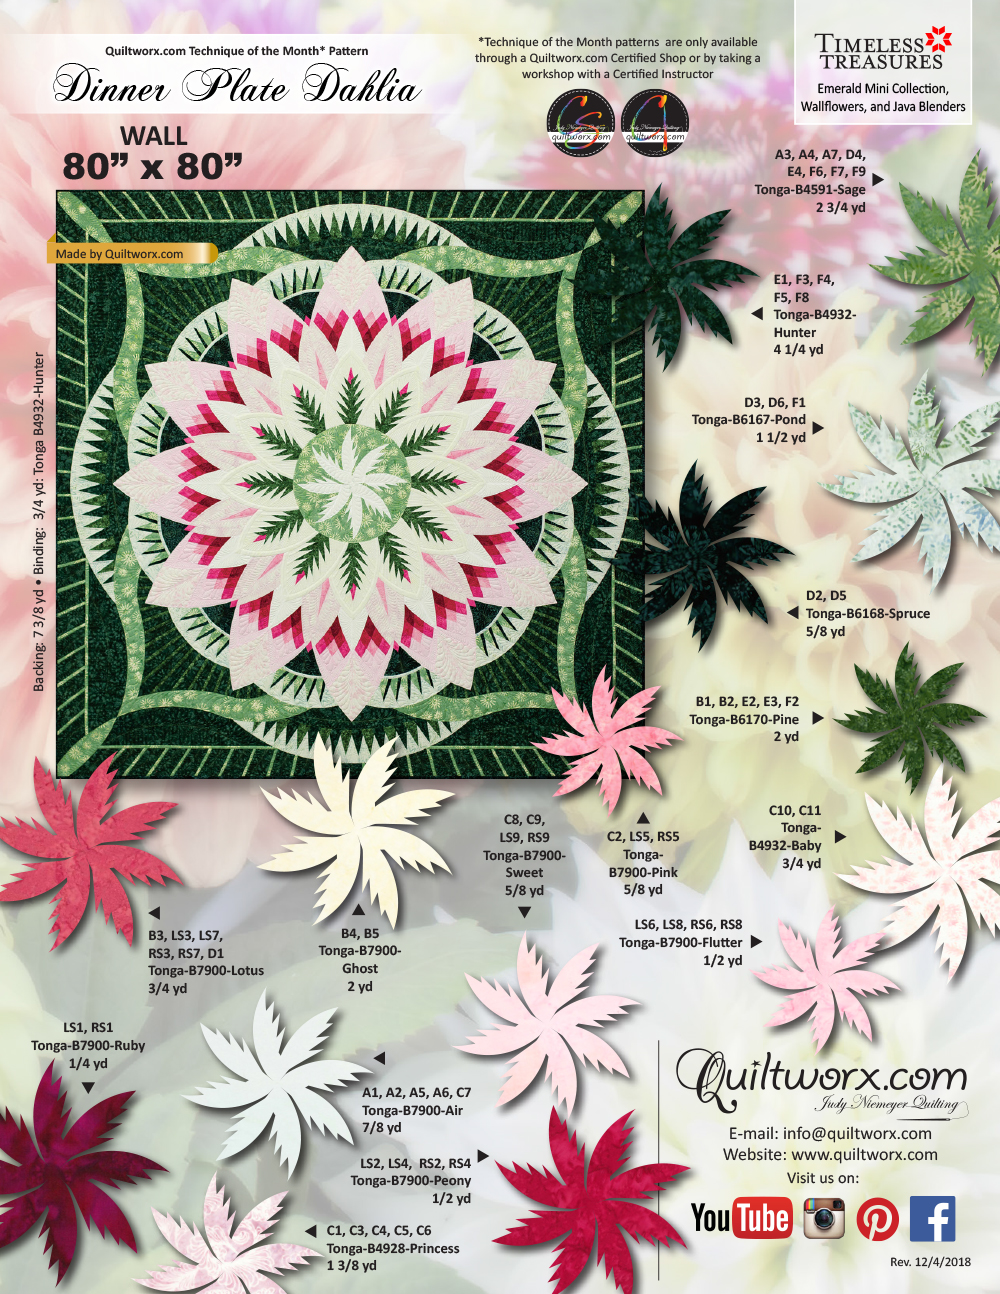 DPD-Wall-Emerald-Wallflowers-KS-1Pg